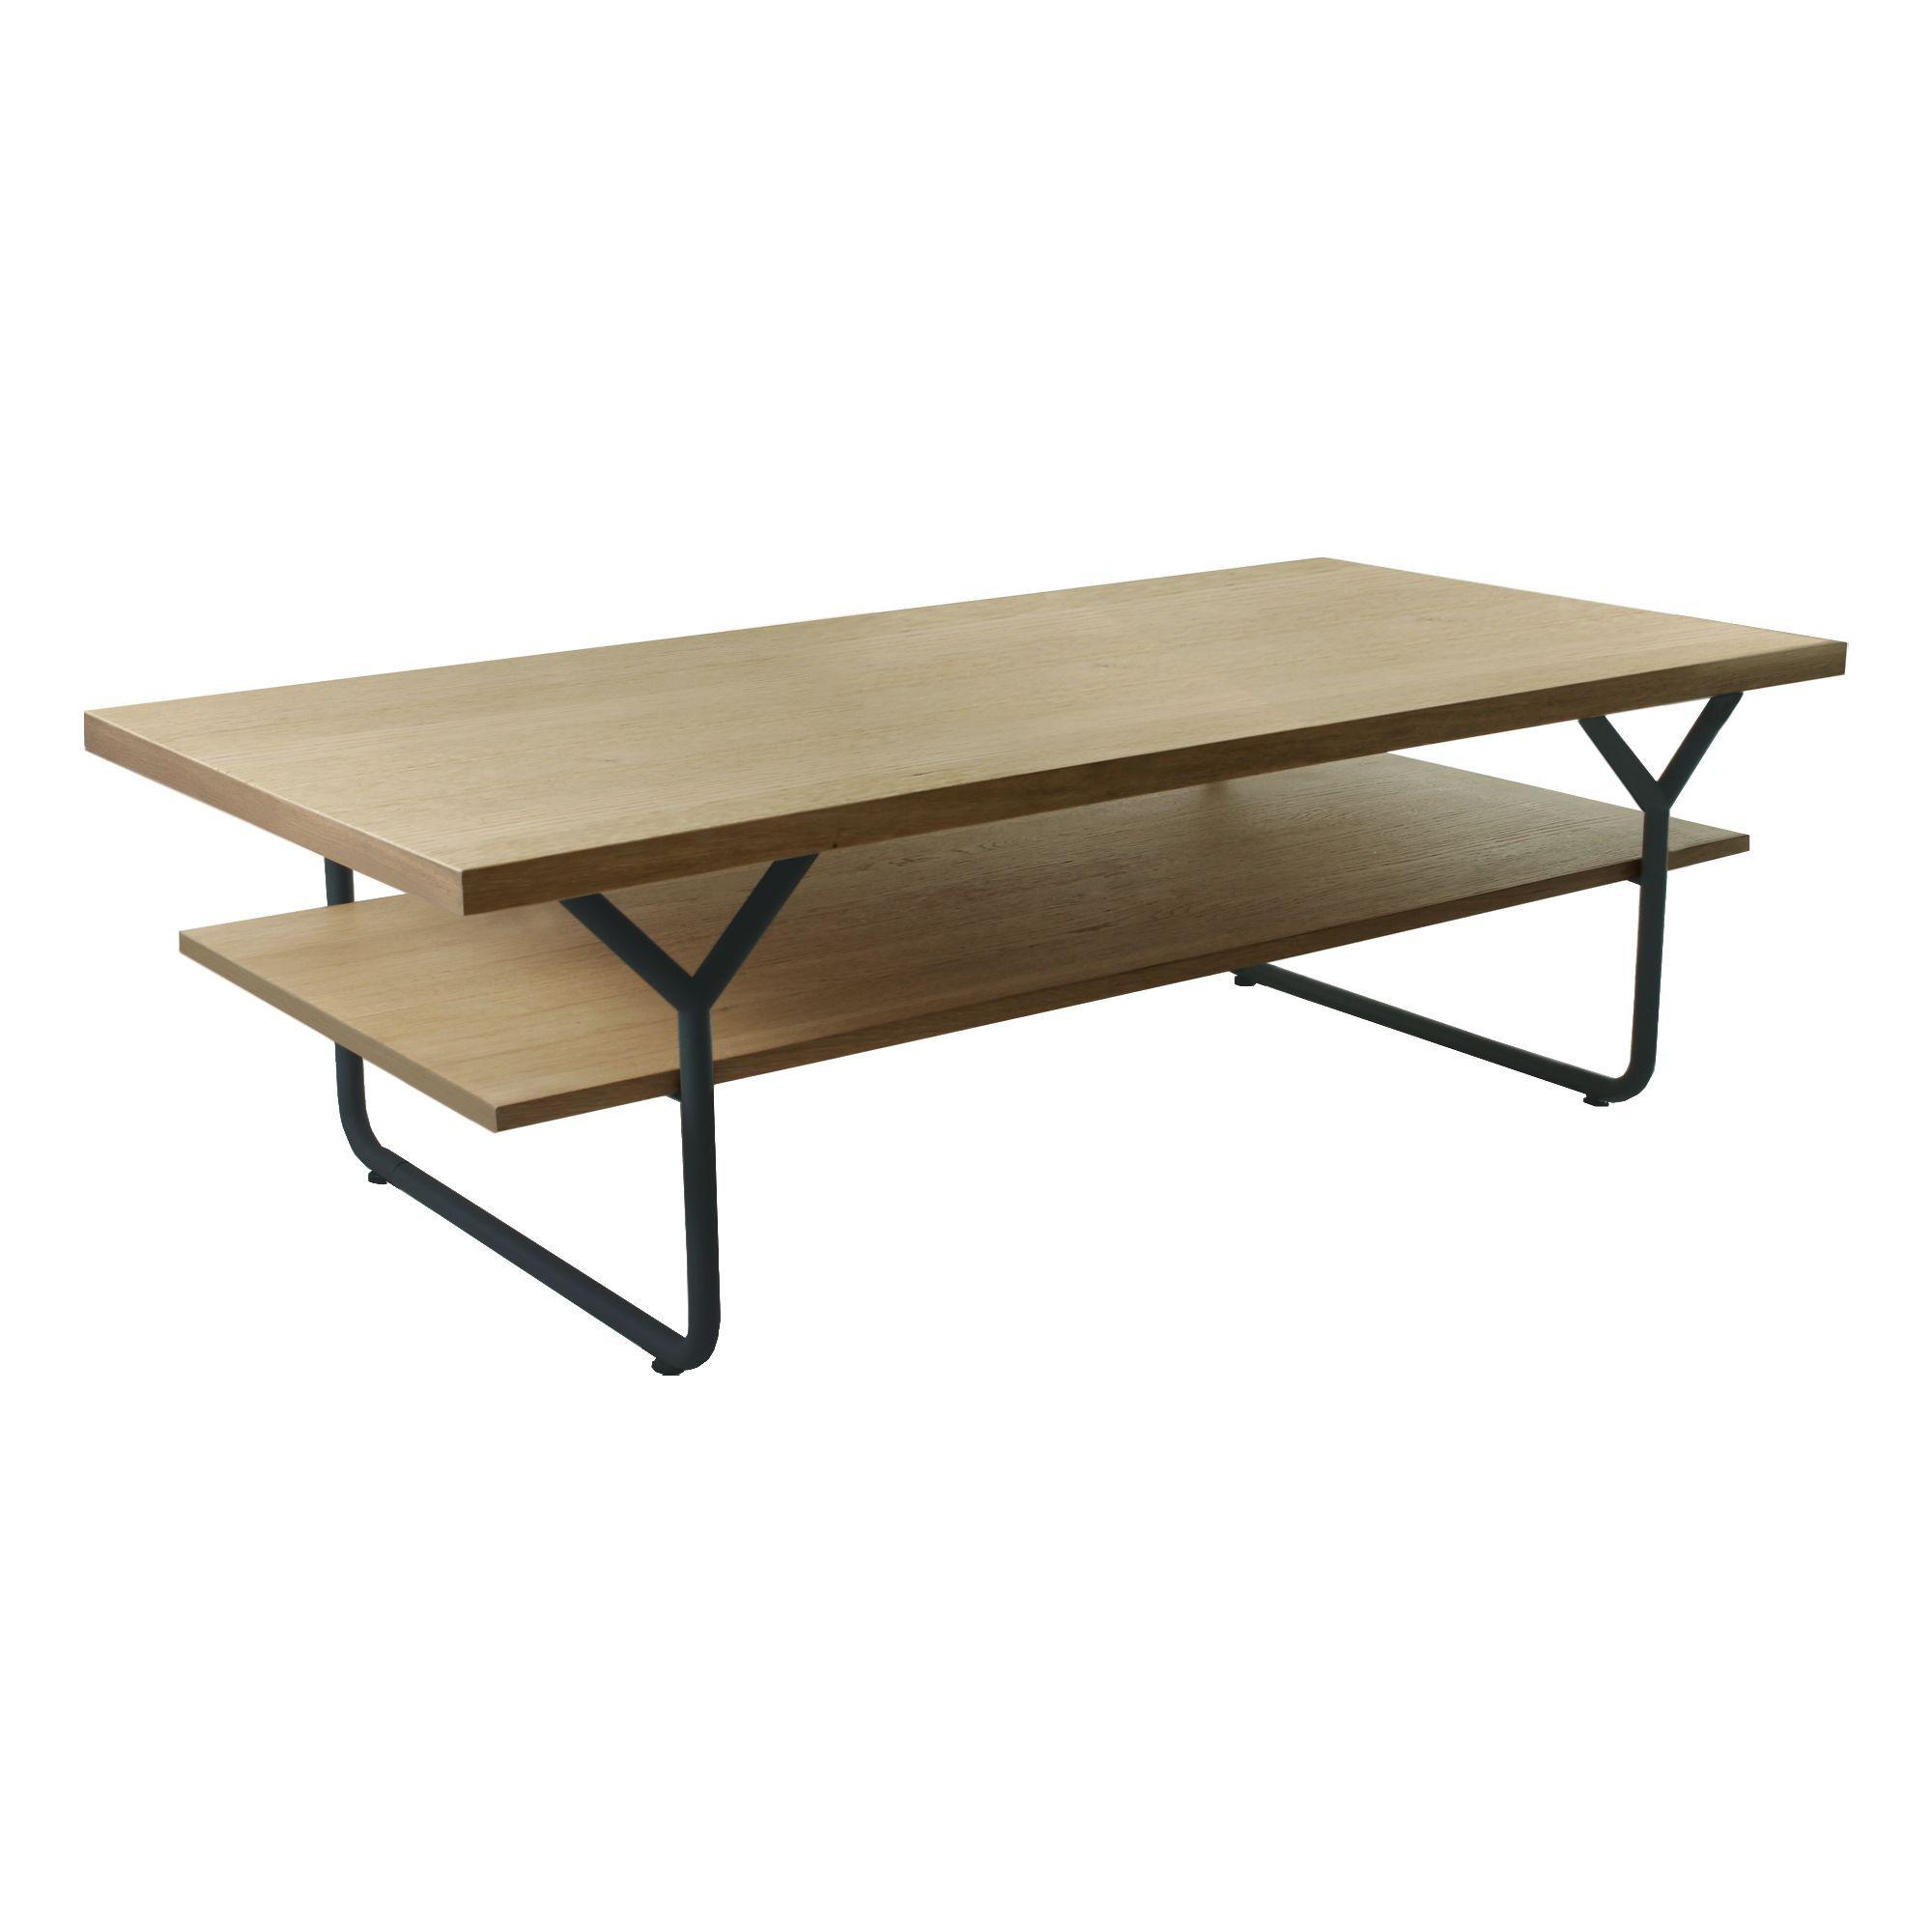 aff8fb3f428629b80bcca1e1cf6c994b Luxe De Table Basse Cdiscount Concept